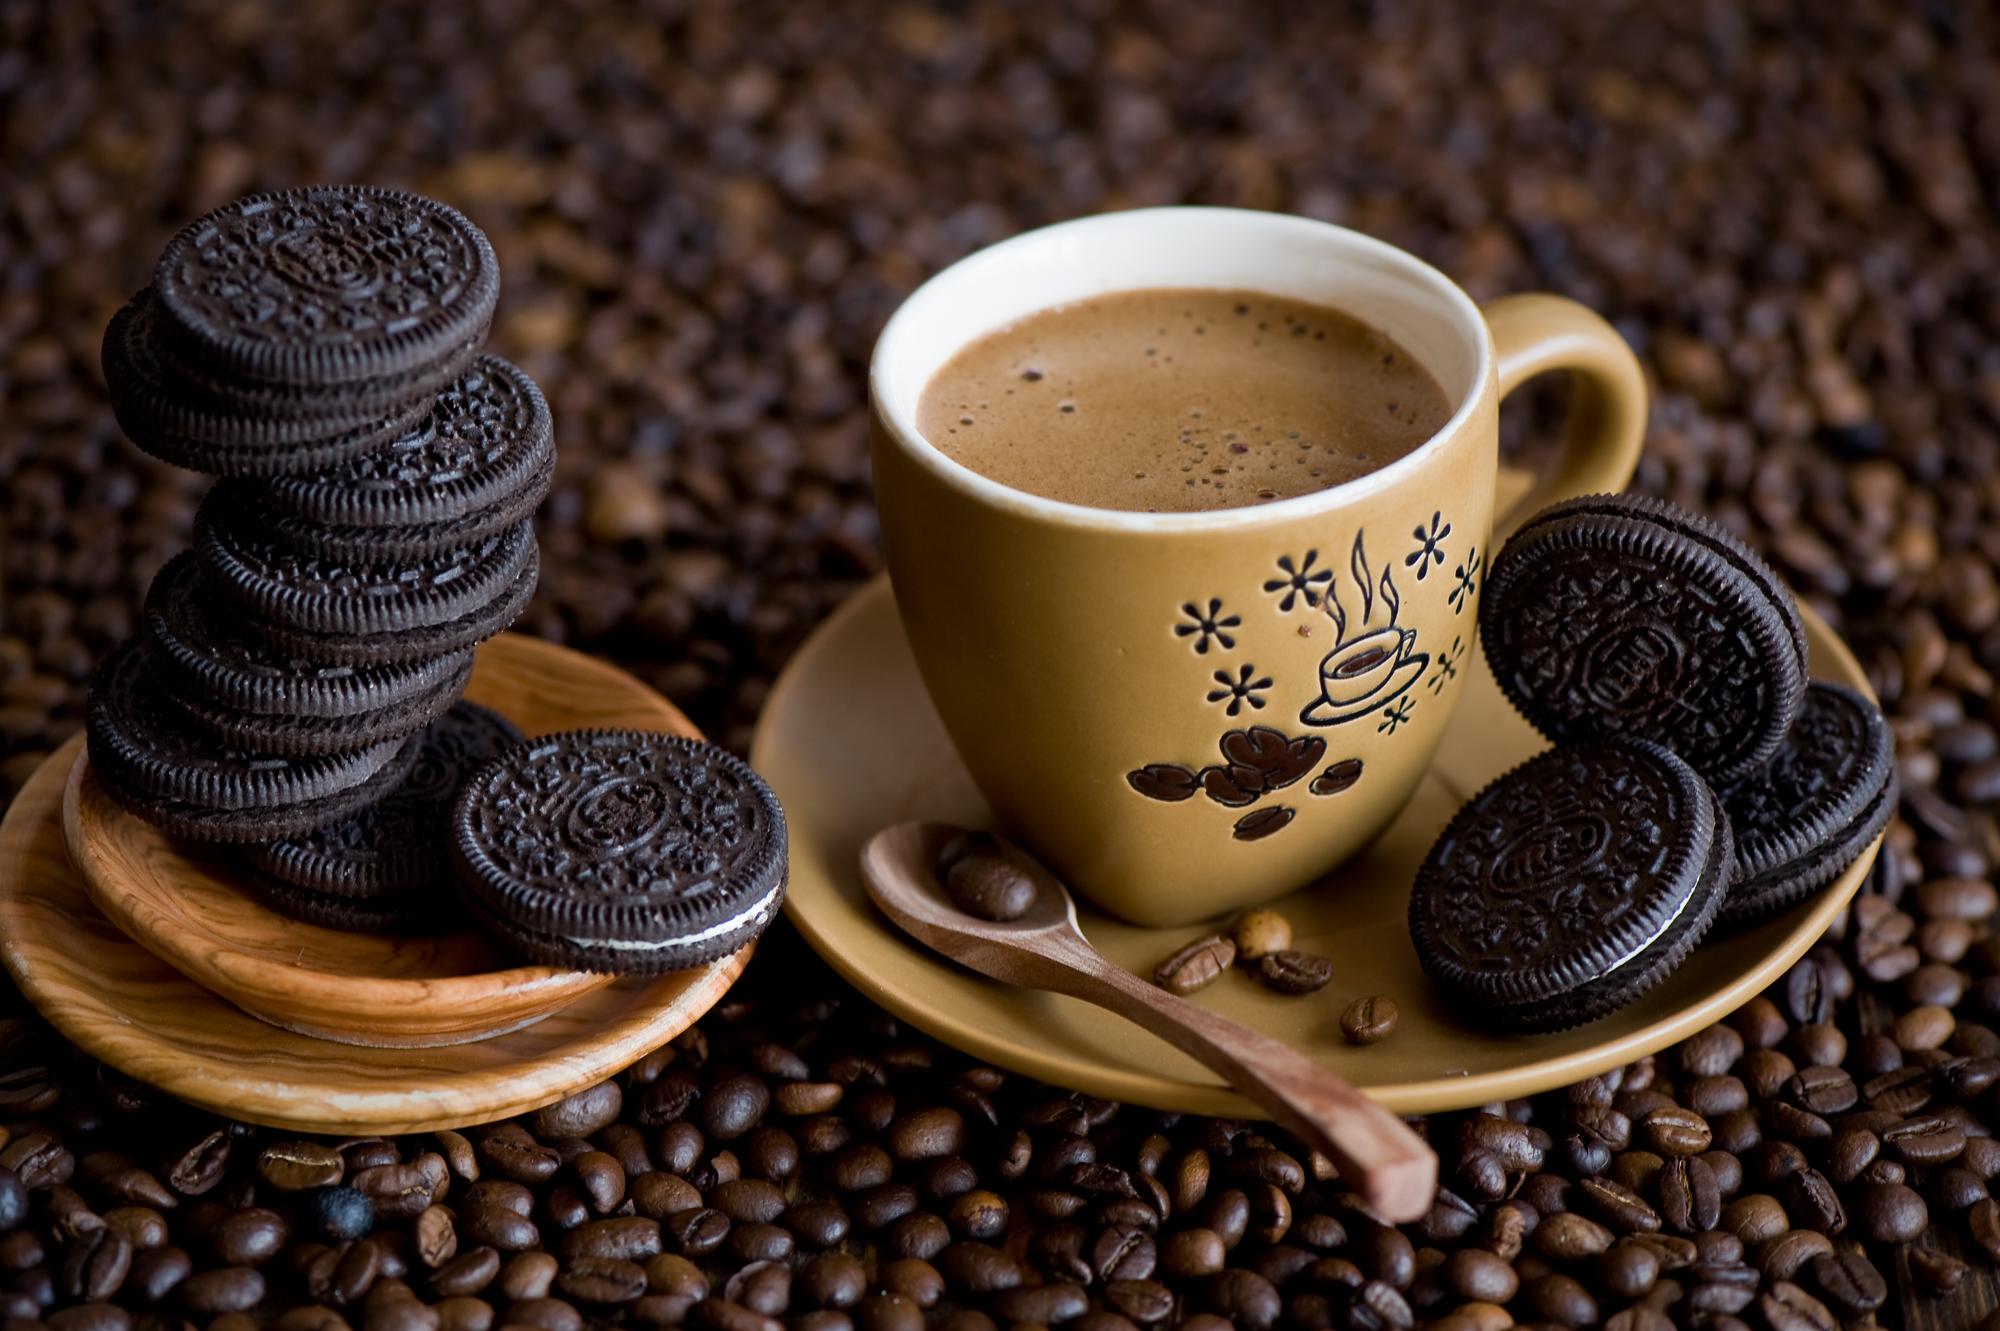 кофе со сладостями  № 140246 бесплатно